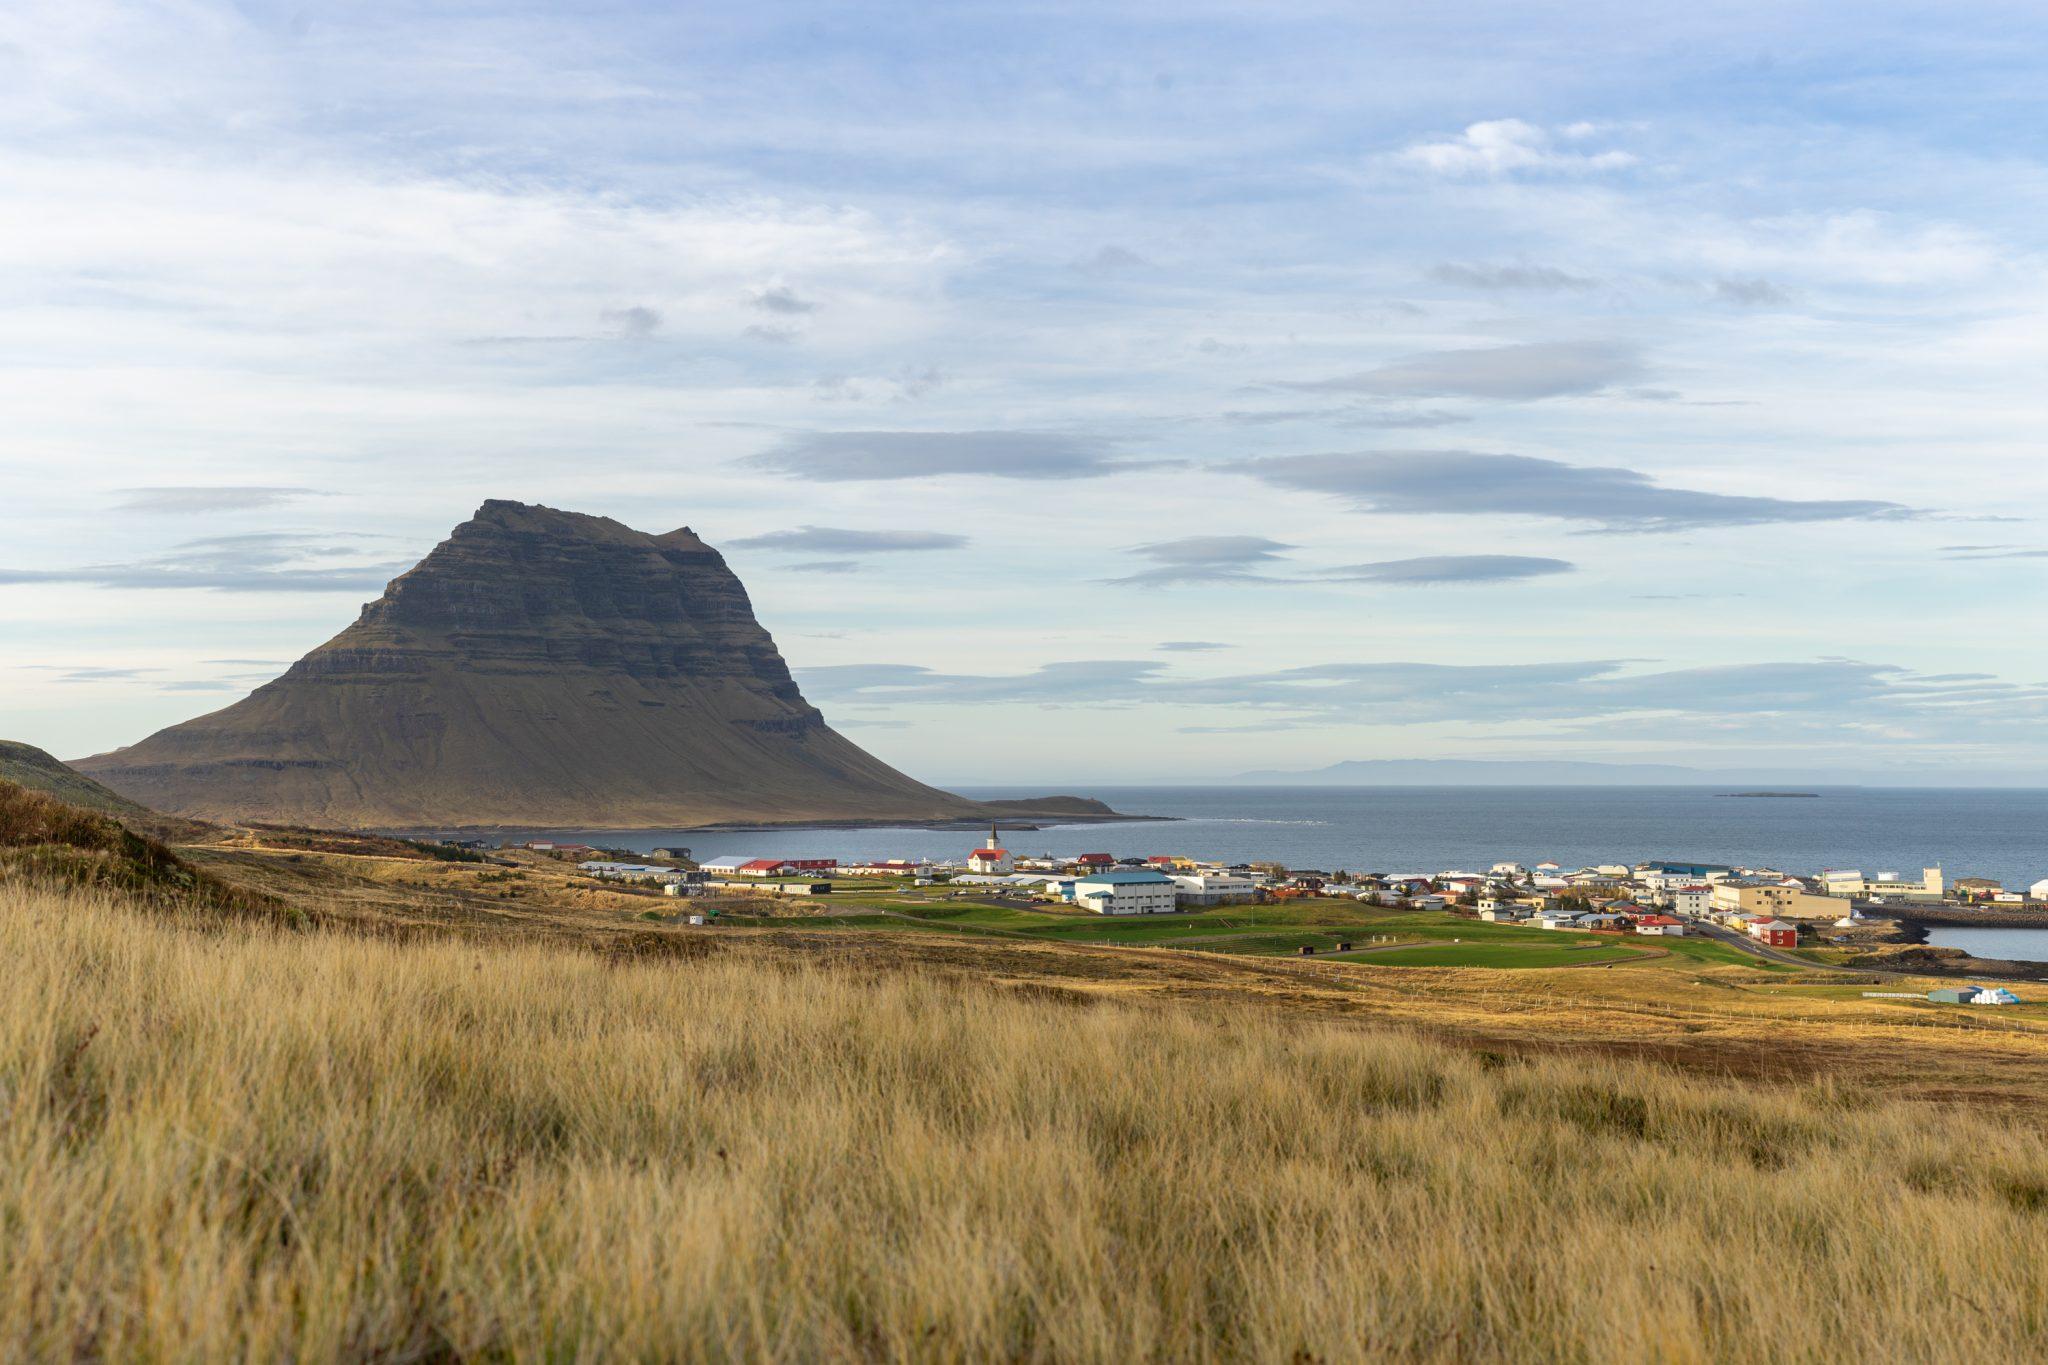 Top 10 Things to Do in Grundarfjordur